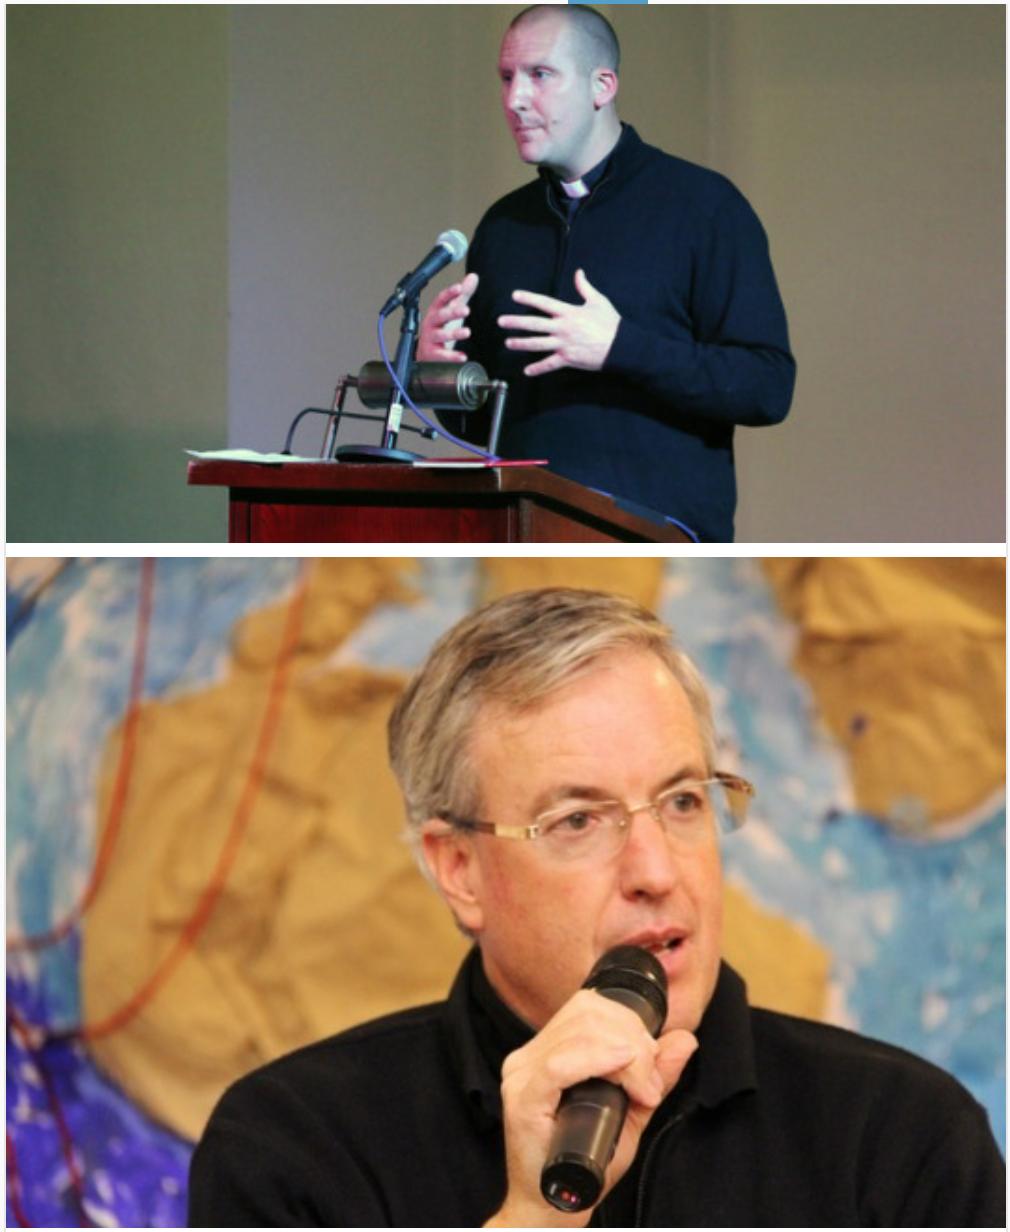 Top: Fr. Joe Freedy speaking at the 2017 Festival of Friendship Bottom: Fr. Vincent Nagle